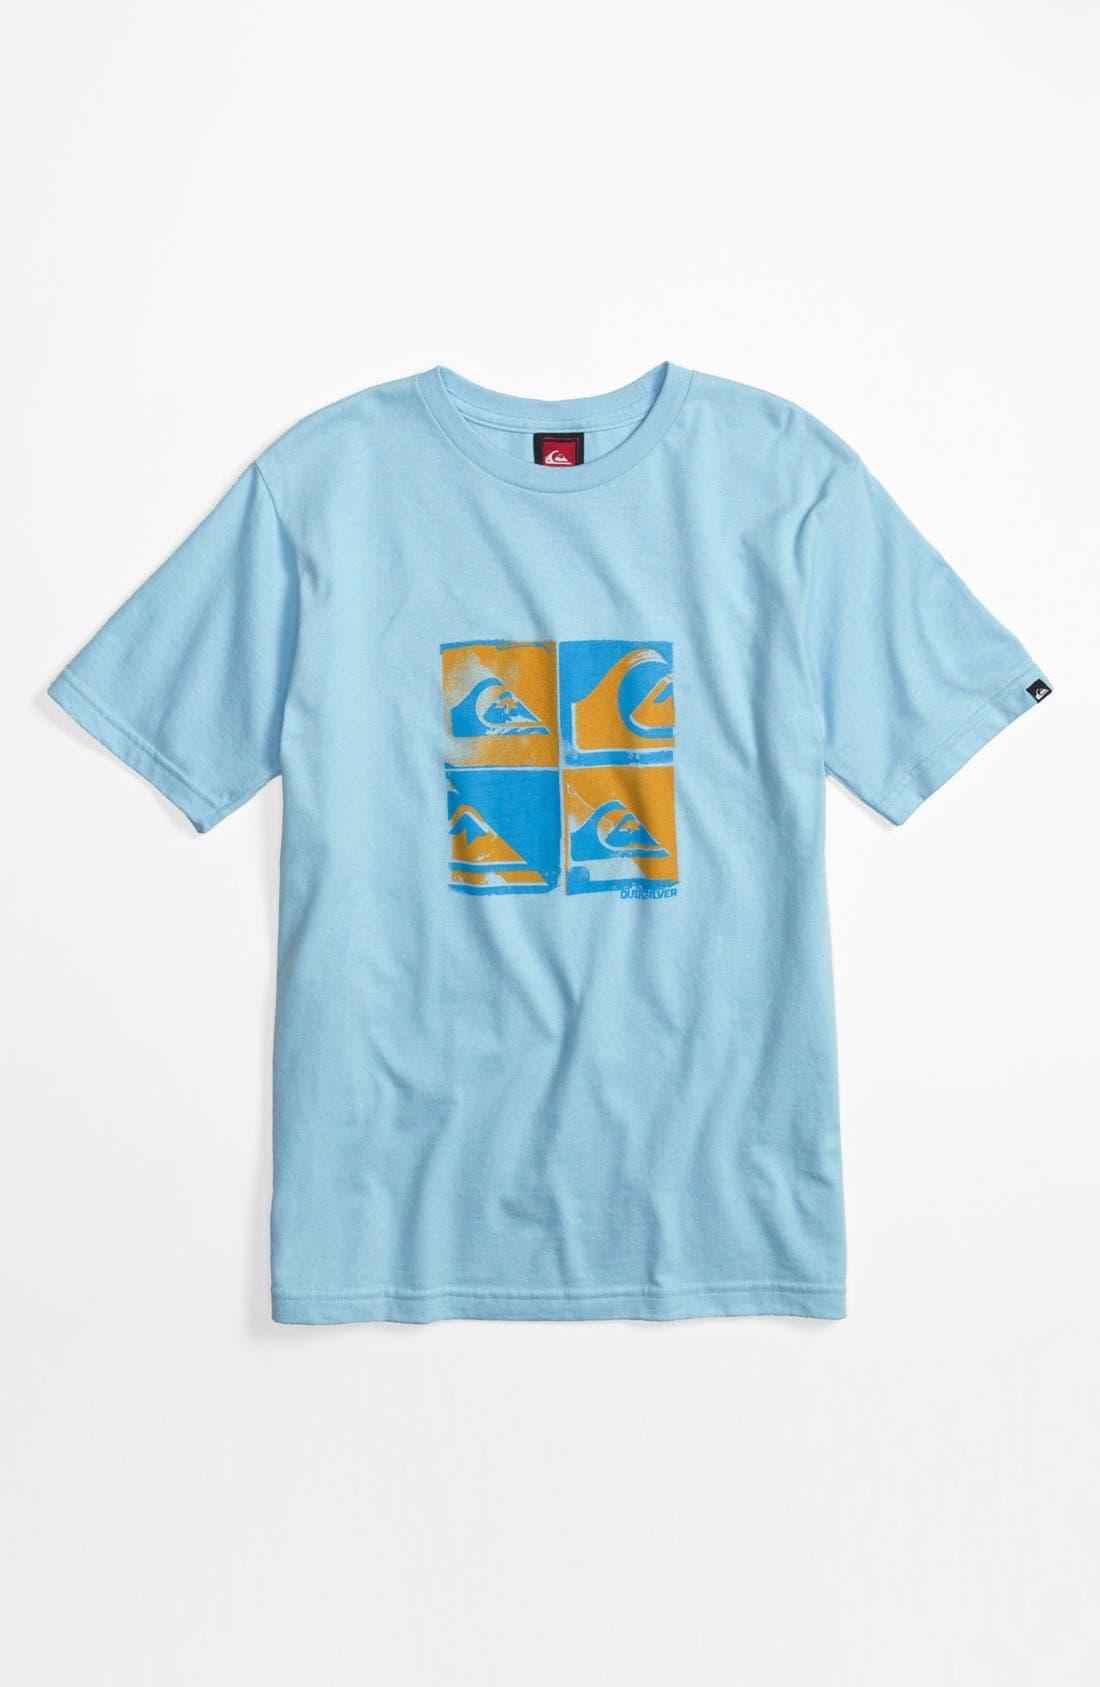 Alternate Image 1 Selected - Quiksilver 'Sunnys' T-Shirt (Big Boys)